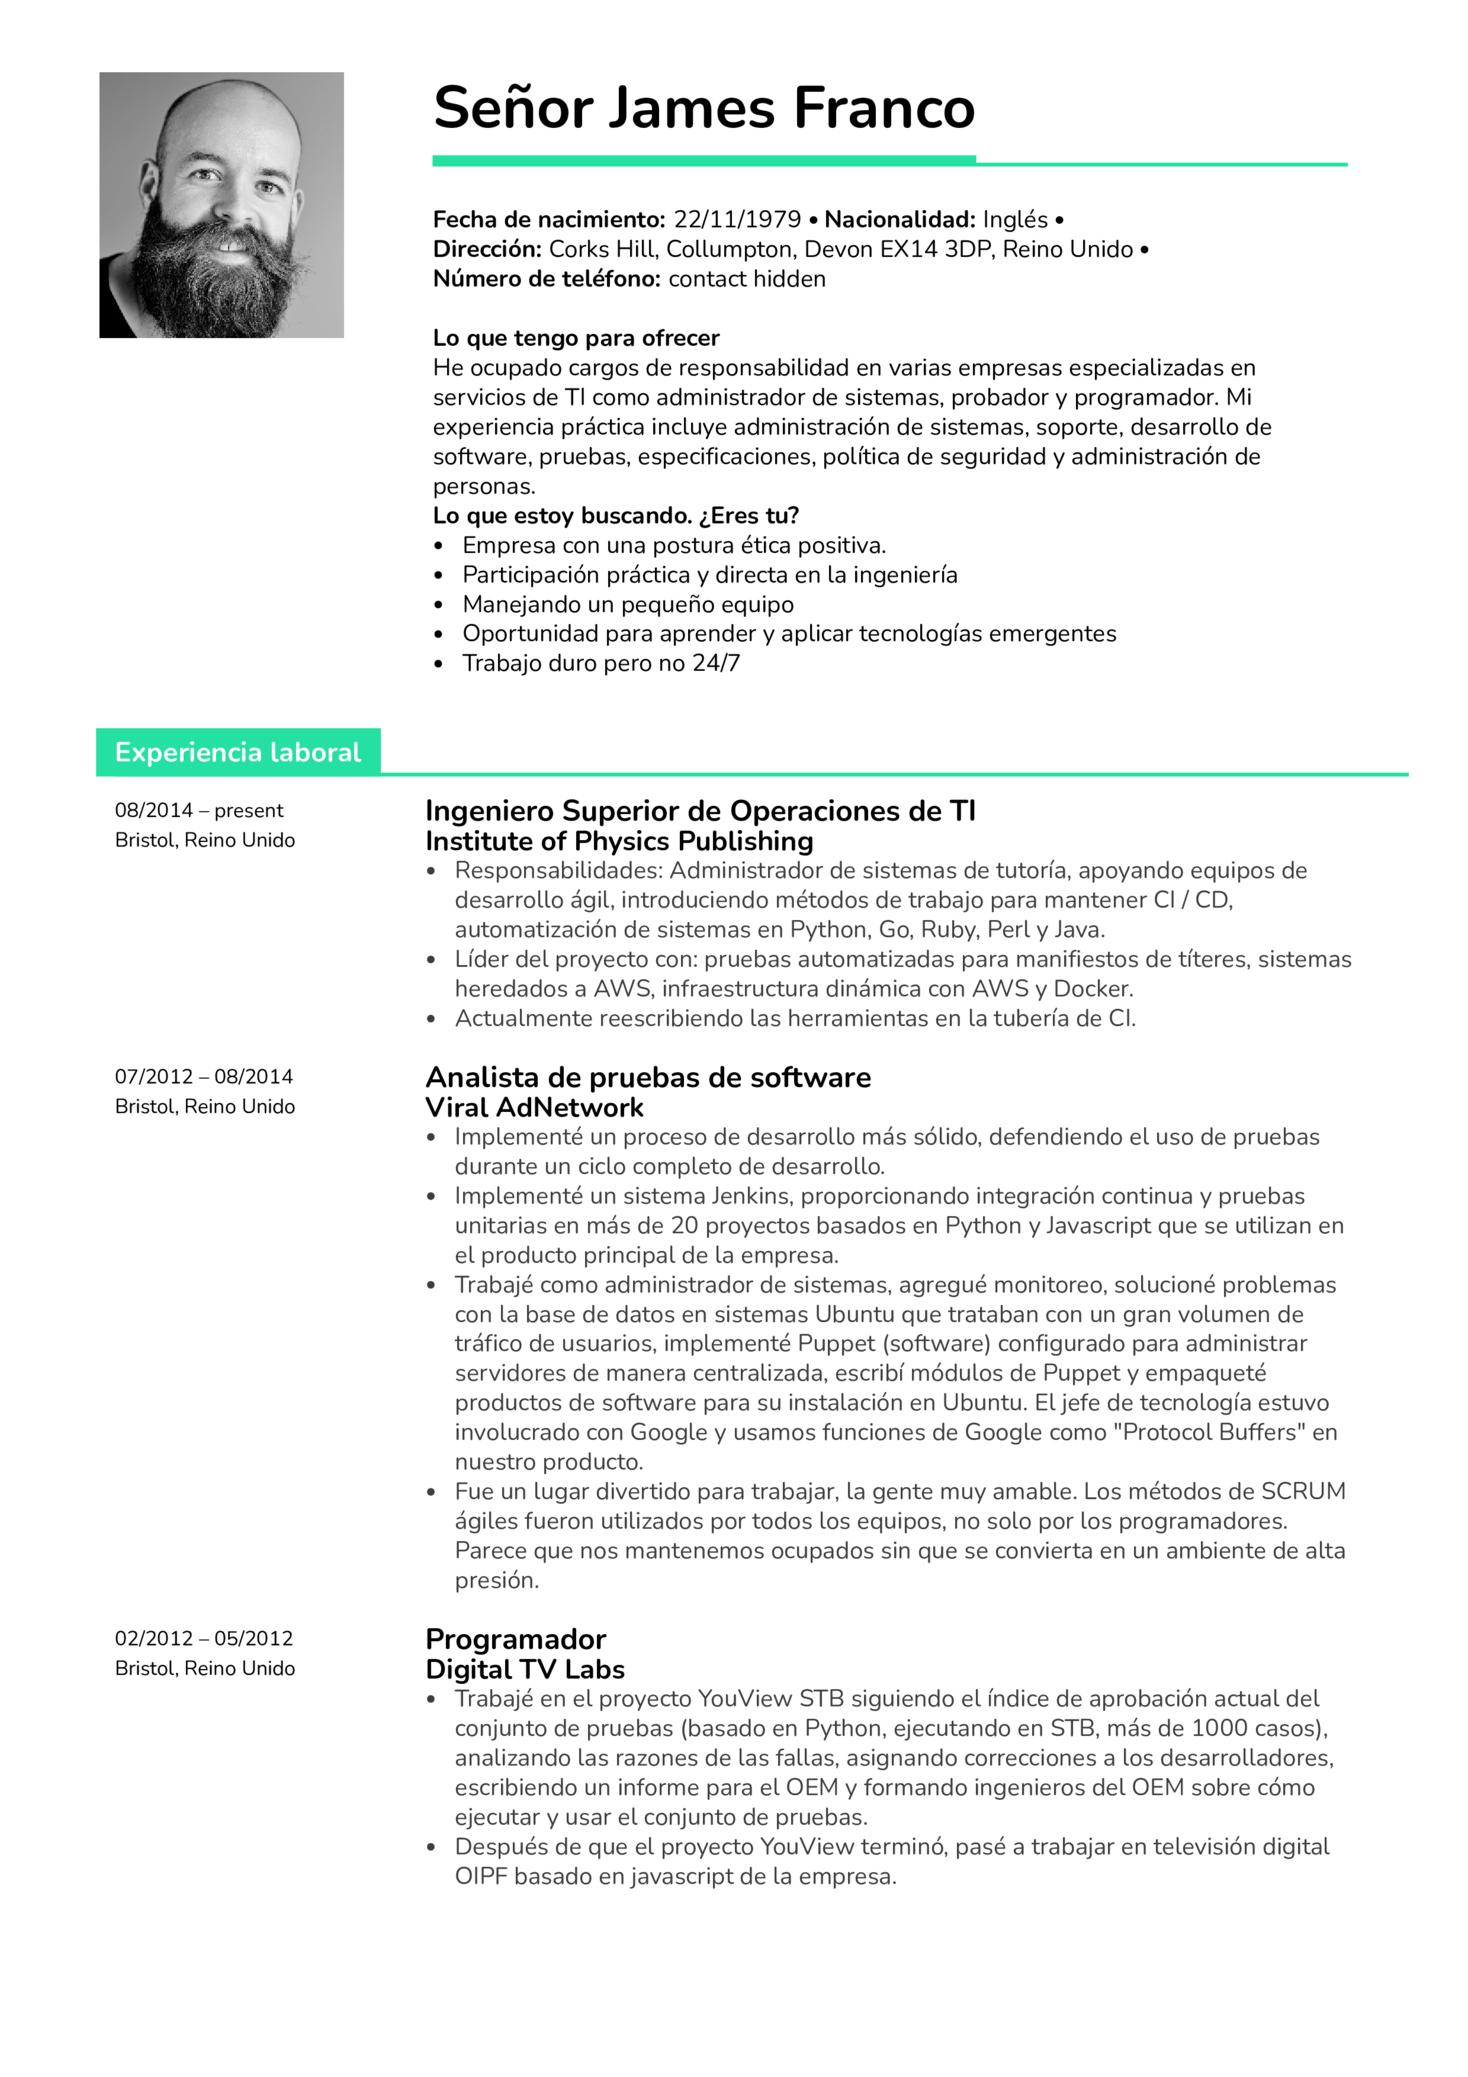 Resume Examples By Real People Ingeniero Superior De